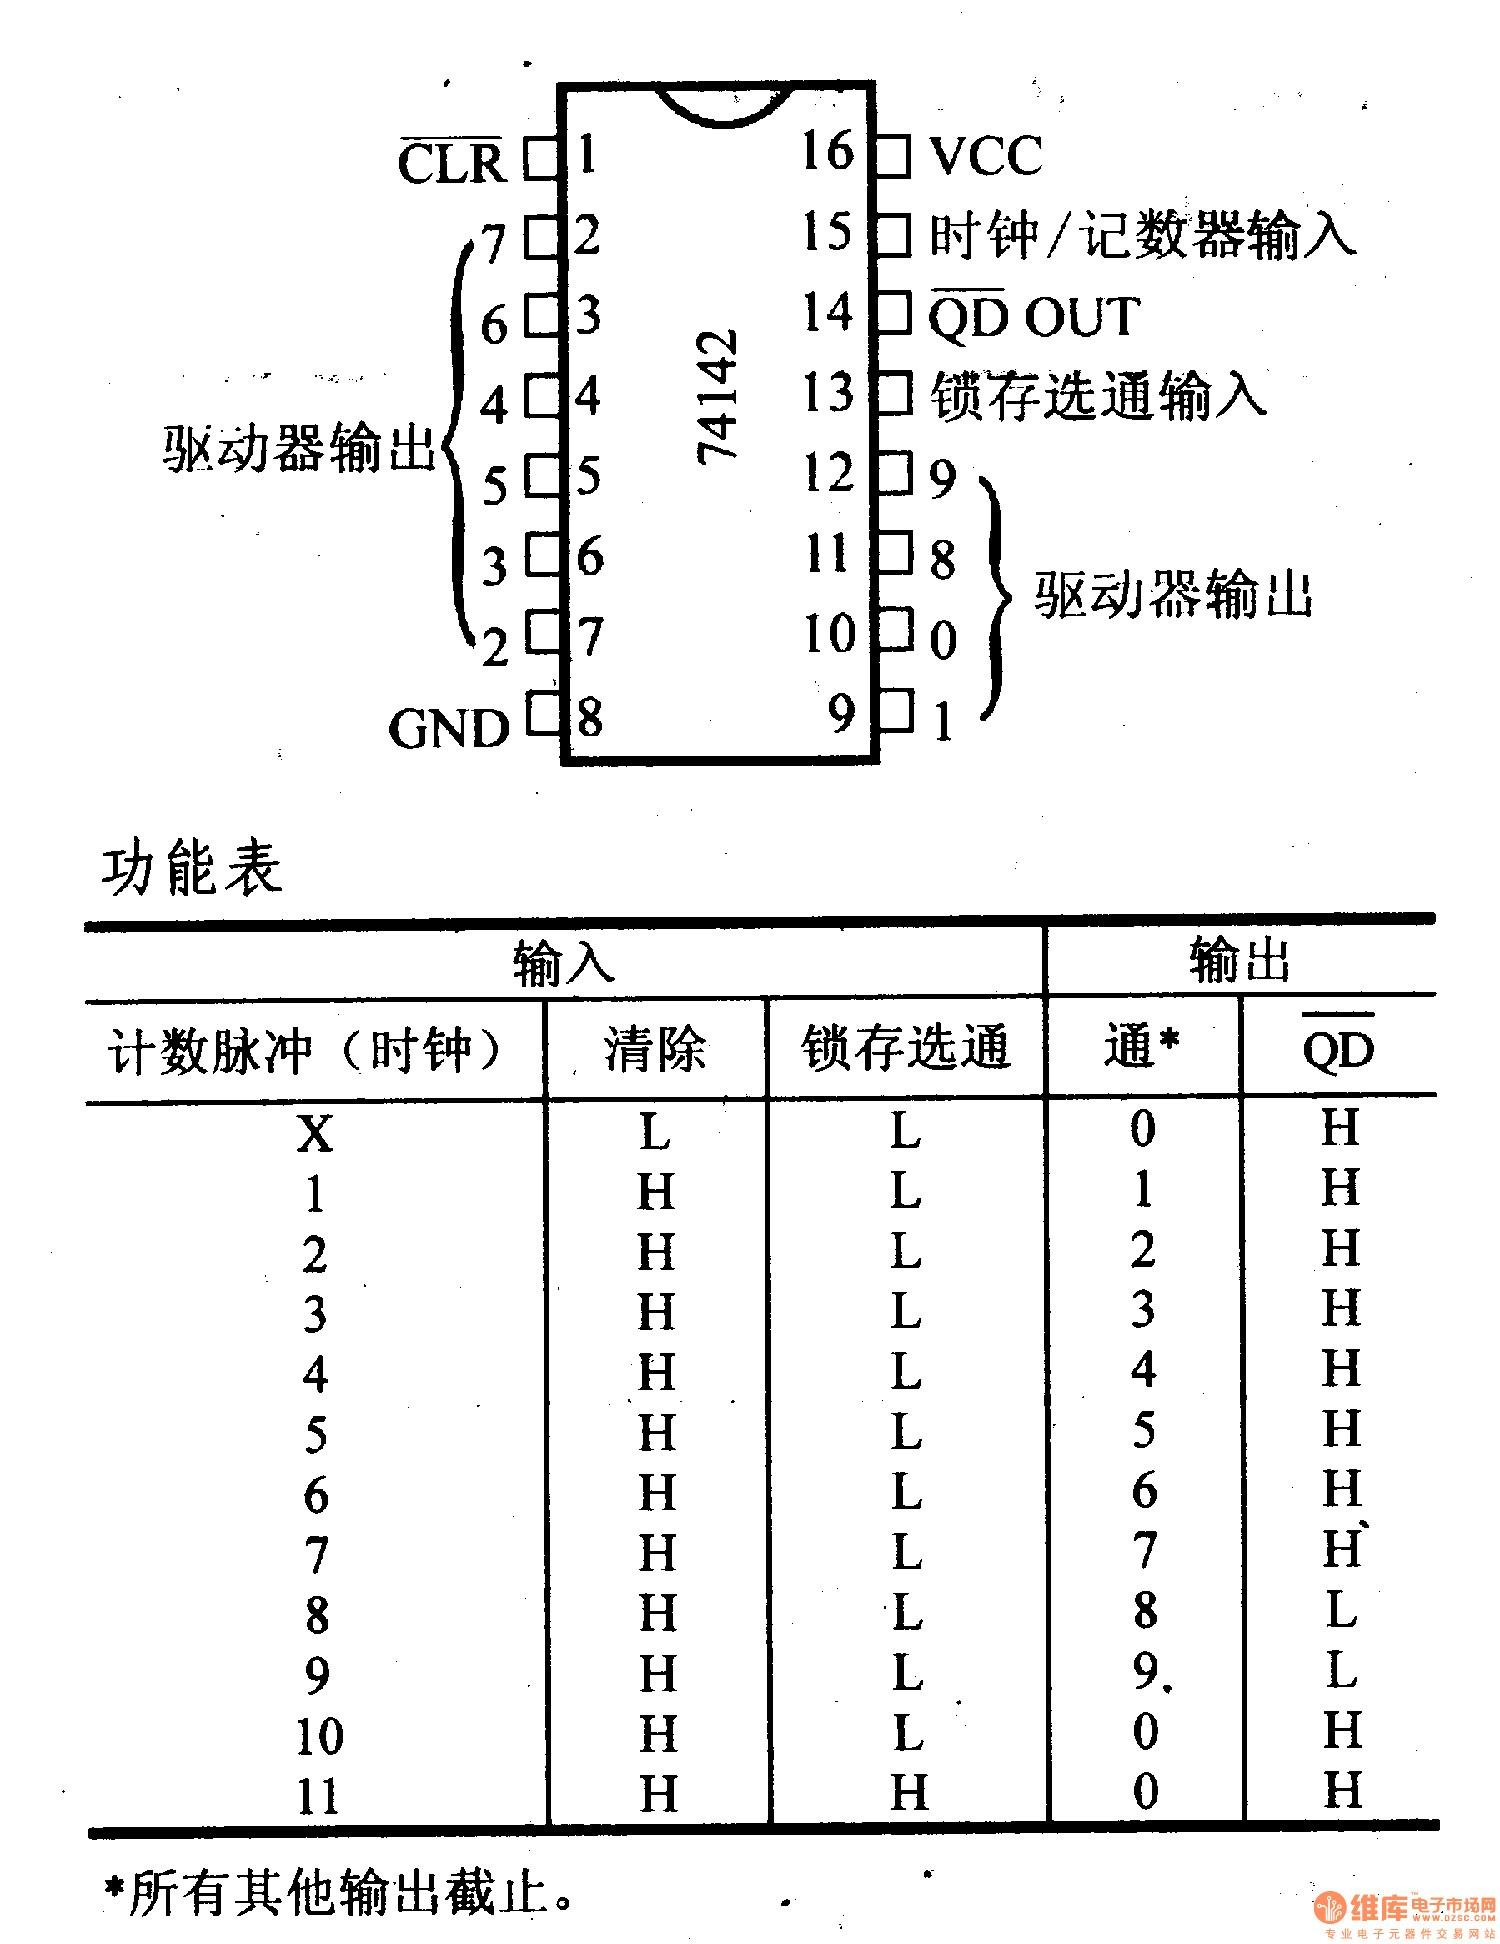 rv holding tank sensor wiring diagram elegant rv holding tank wiring diagram reference rv holding tank